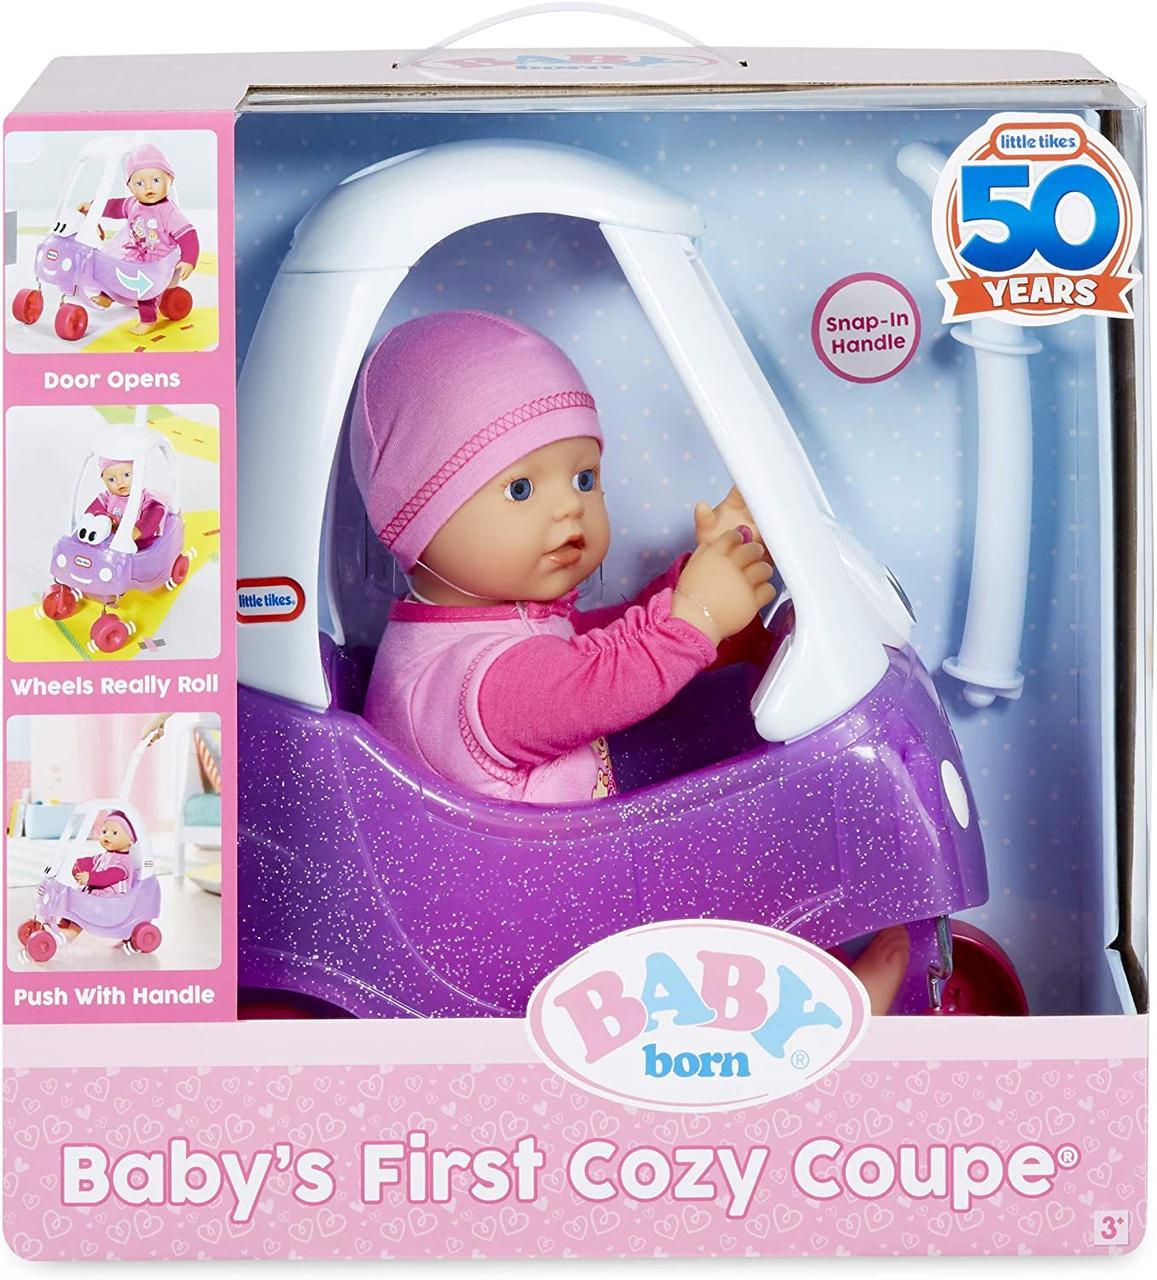 Беби Борн Перша затишна машина Baby Born baby's First Cozy Coupe